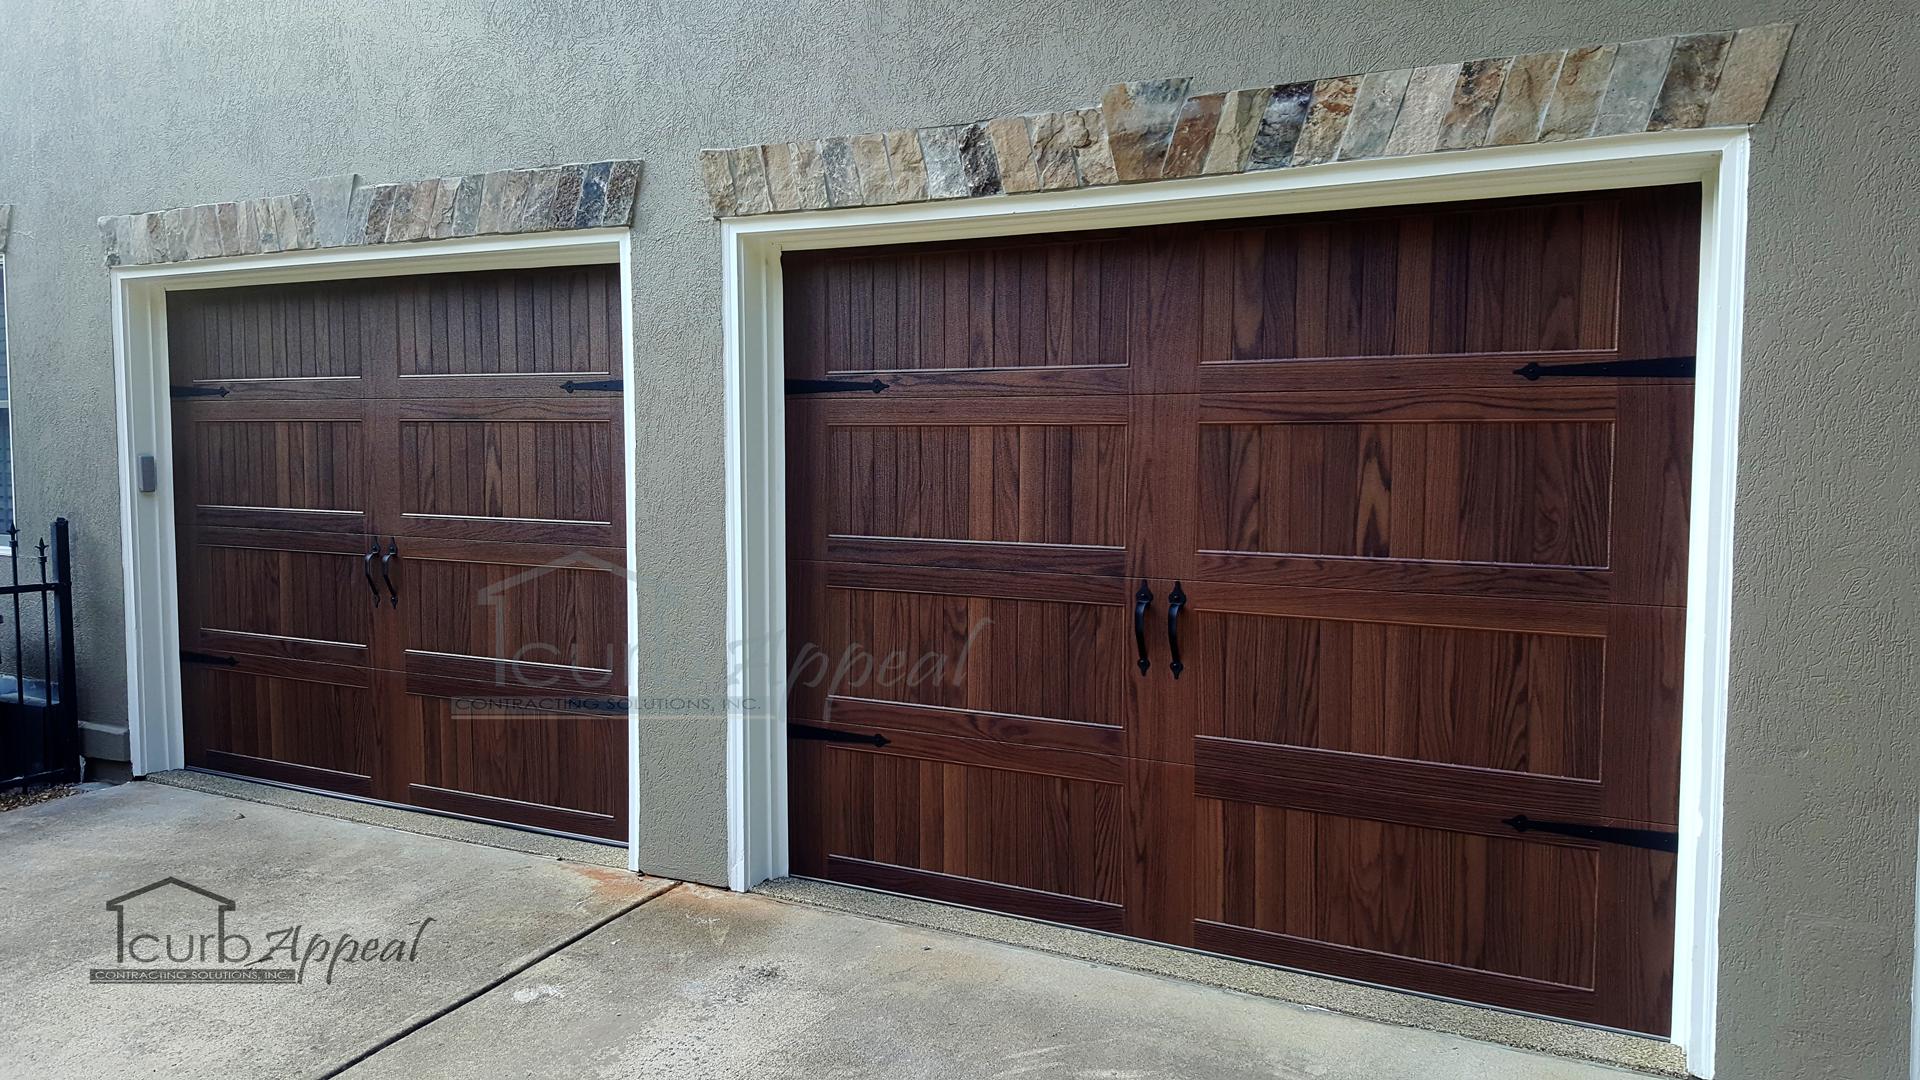 Faux wood garage doors installed in Atlanta, GA